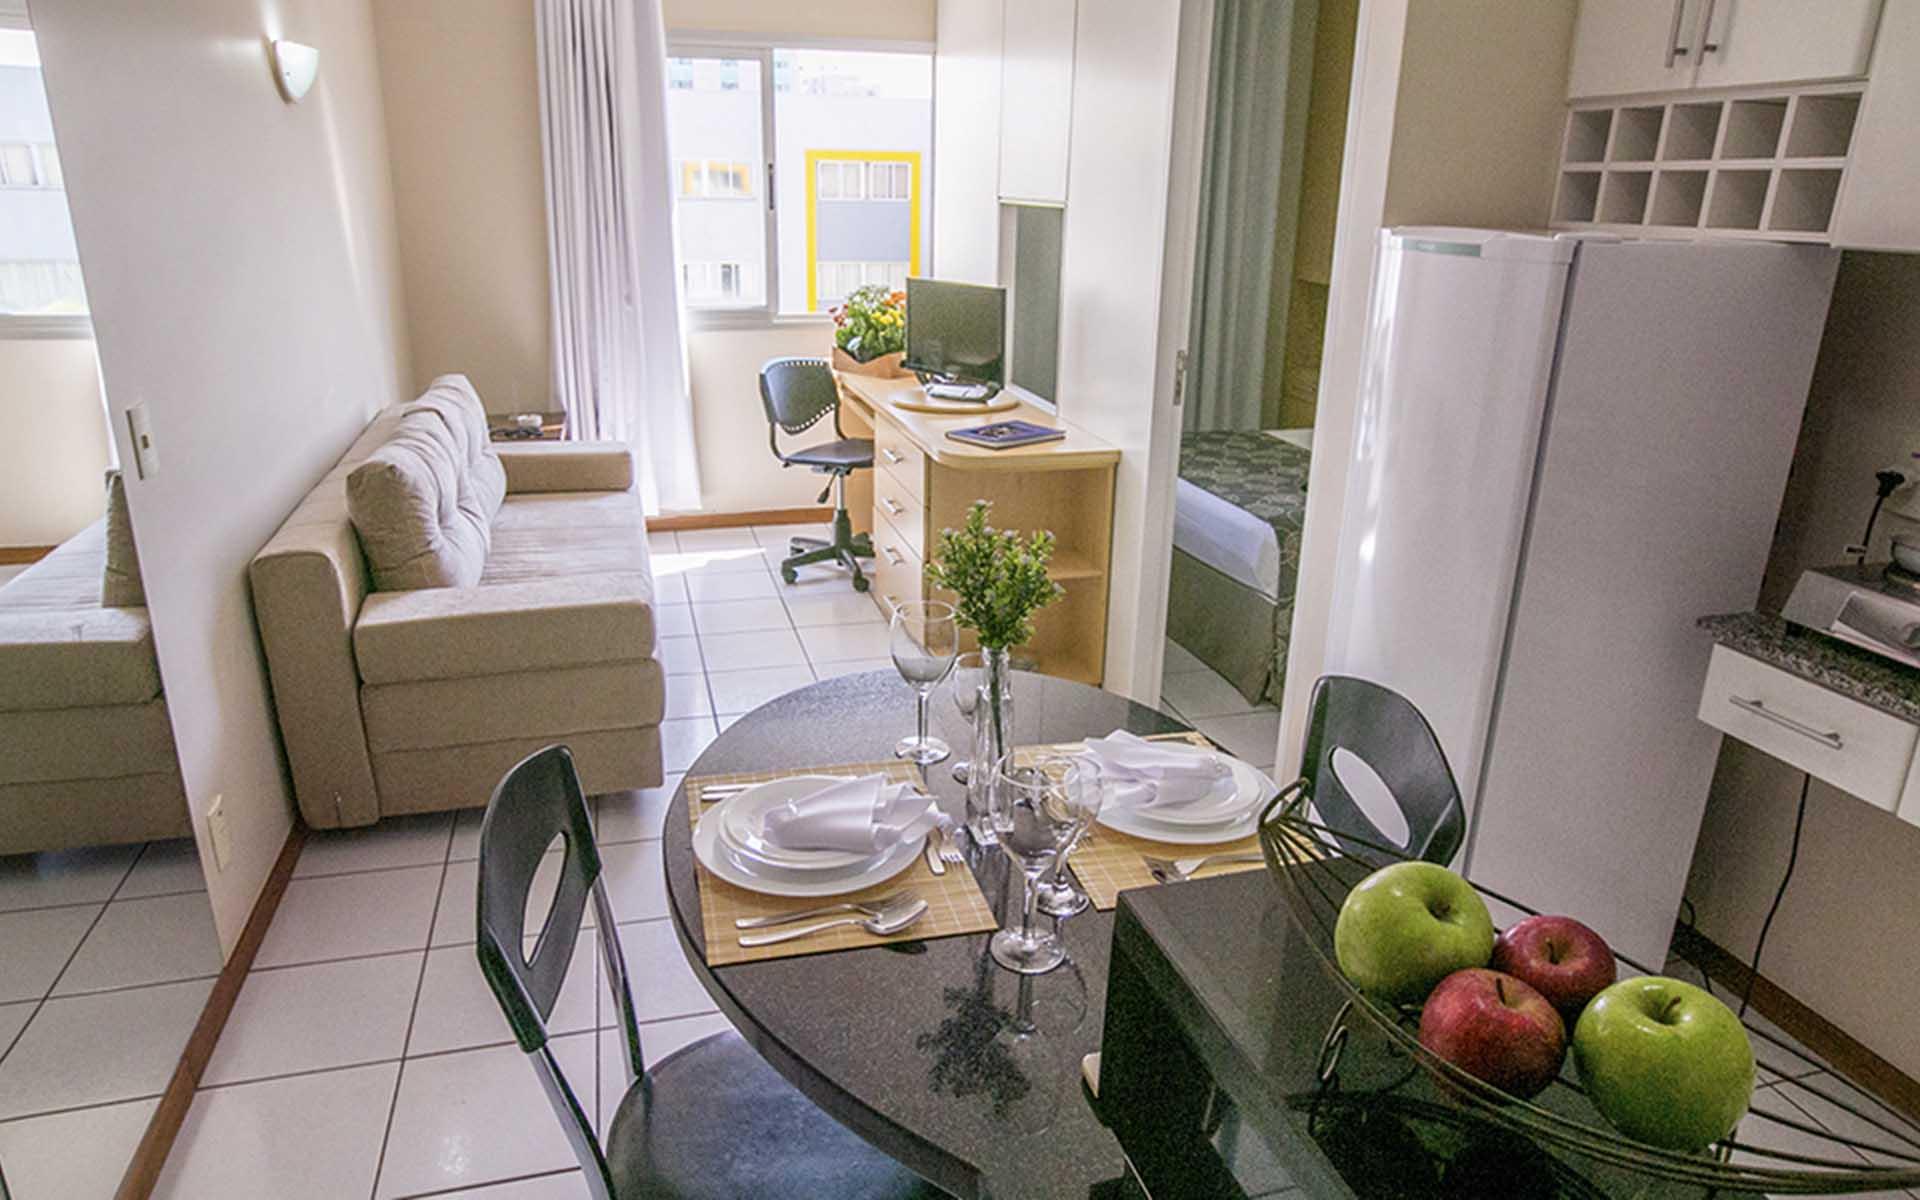 quarto luxo do apart hotel flat em brasilia multiparque hplus long stay